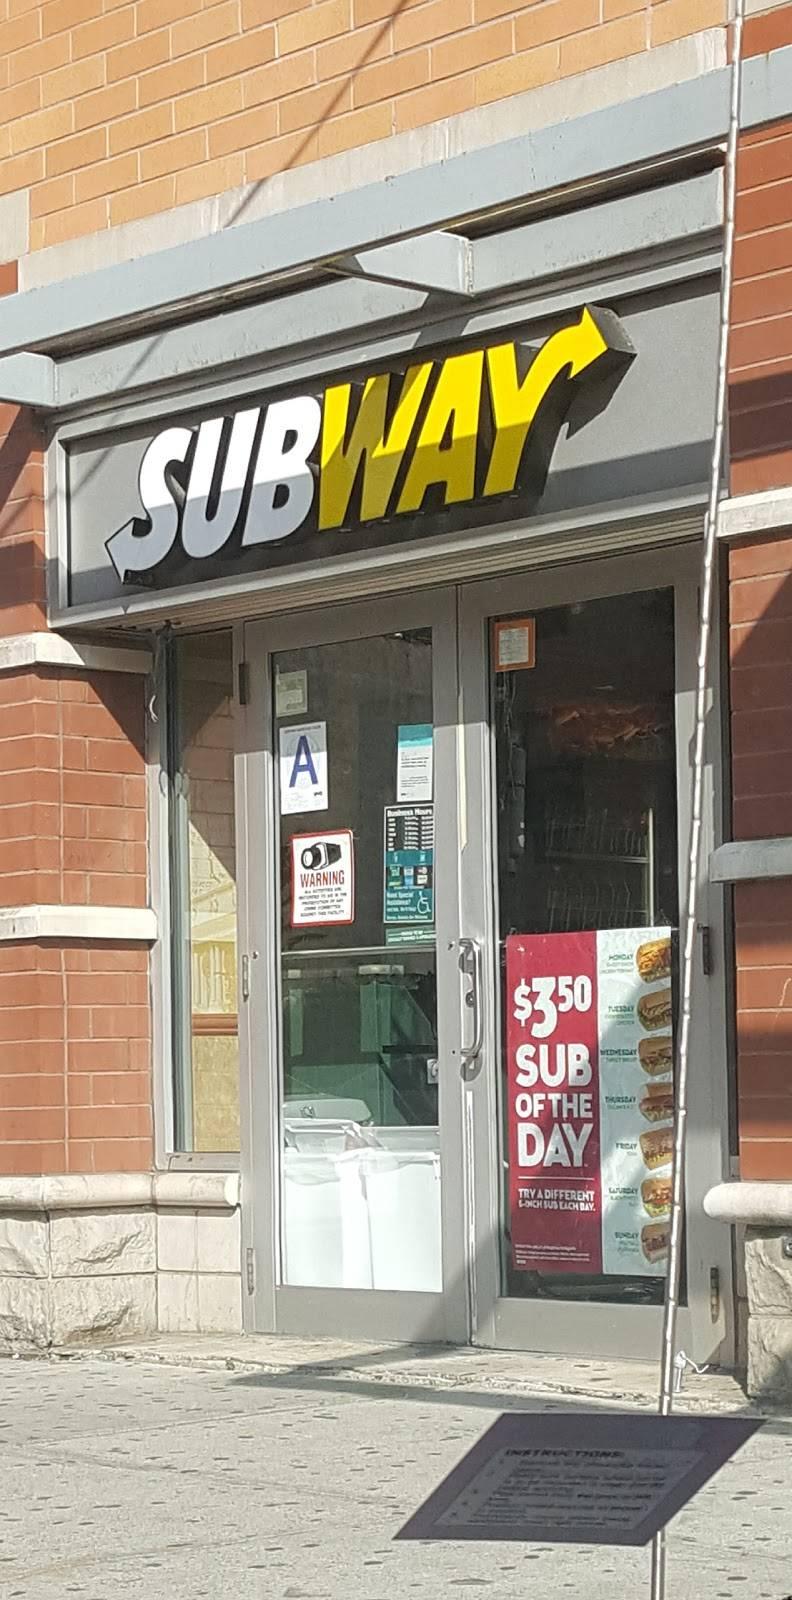 Subway Restaurants   restaurant   3044 3rd Ave, Bronx, NY 10451, USA   7184844070 OR +1 718-484-4070